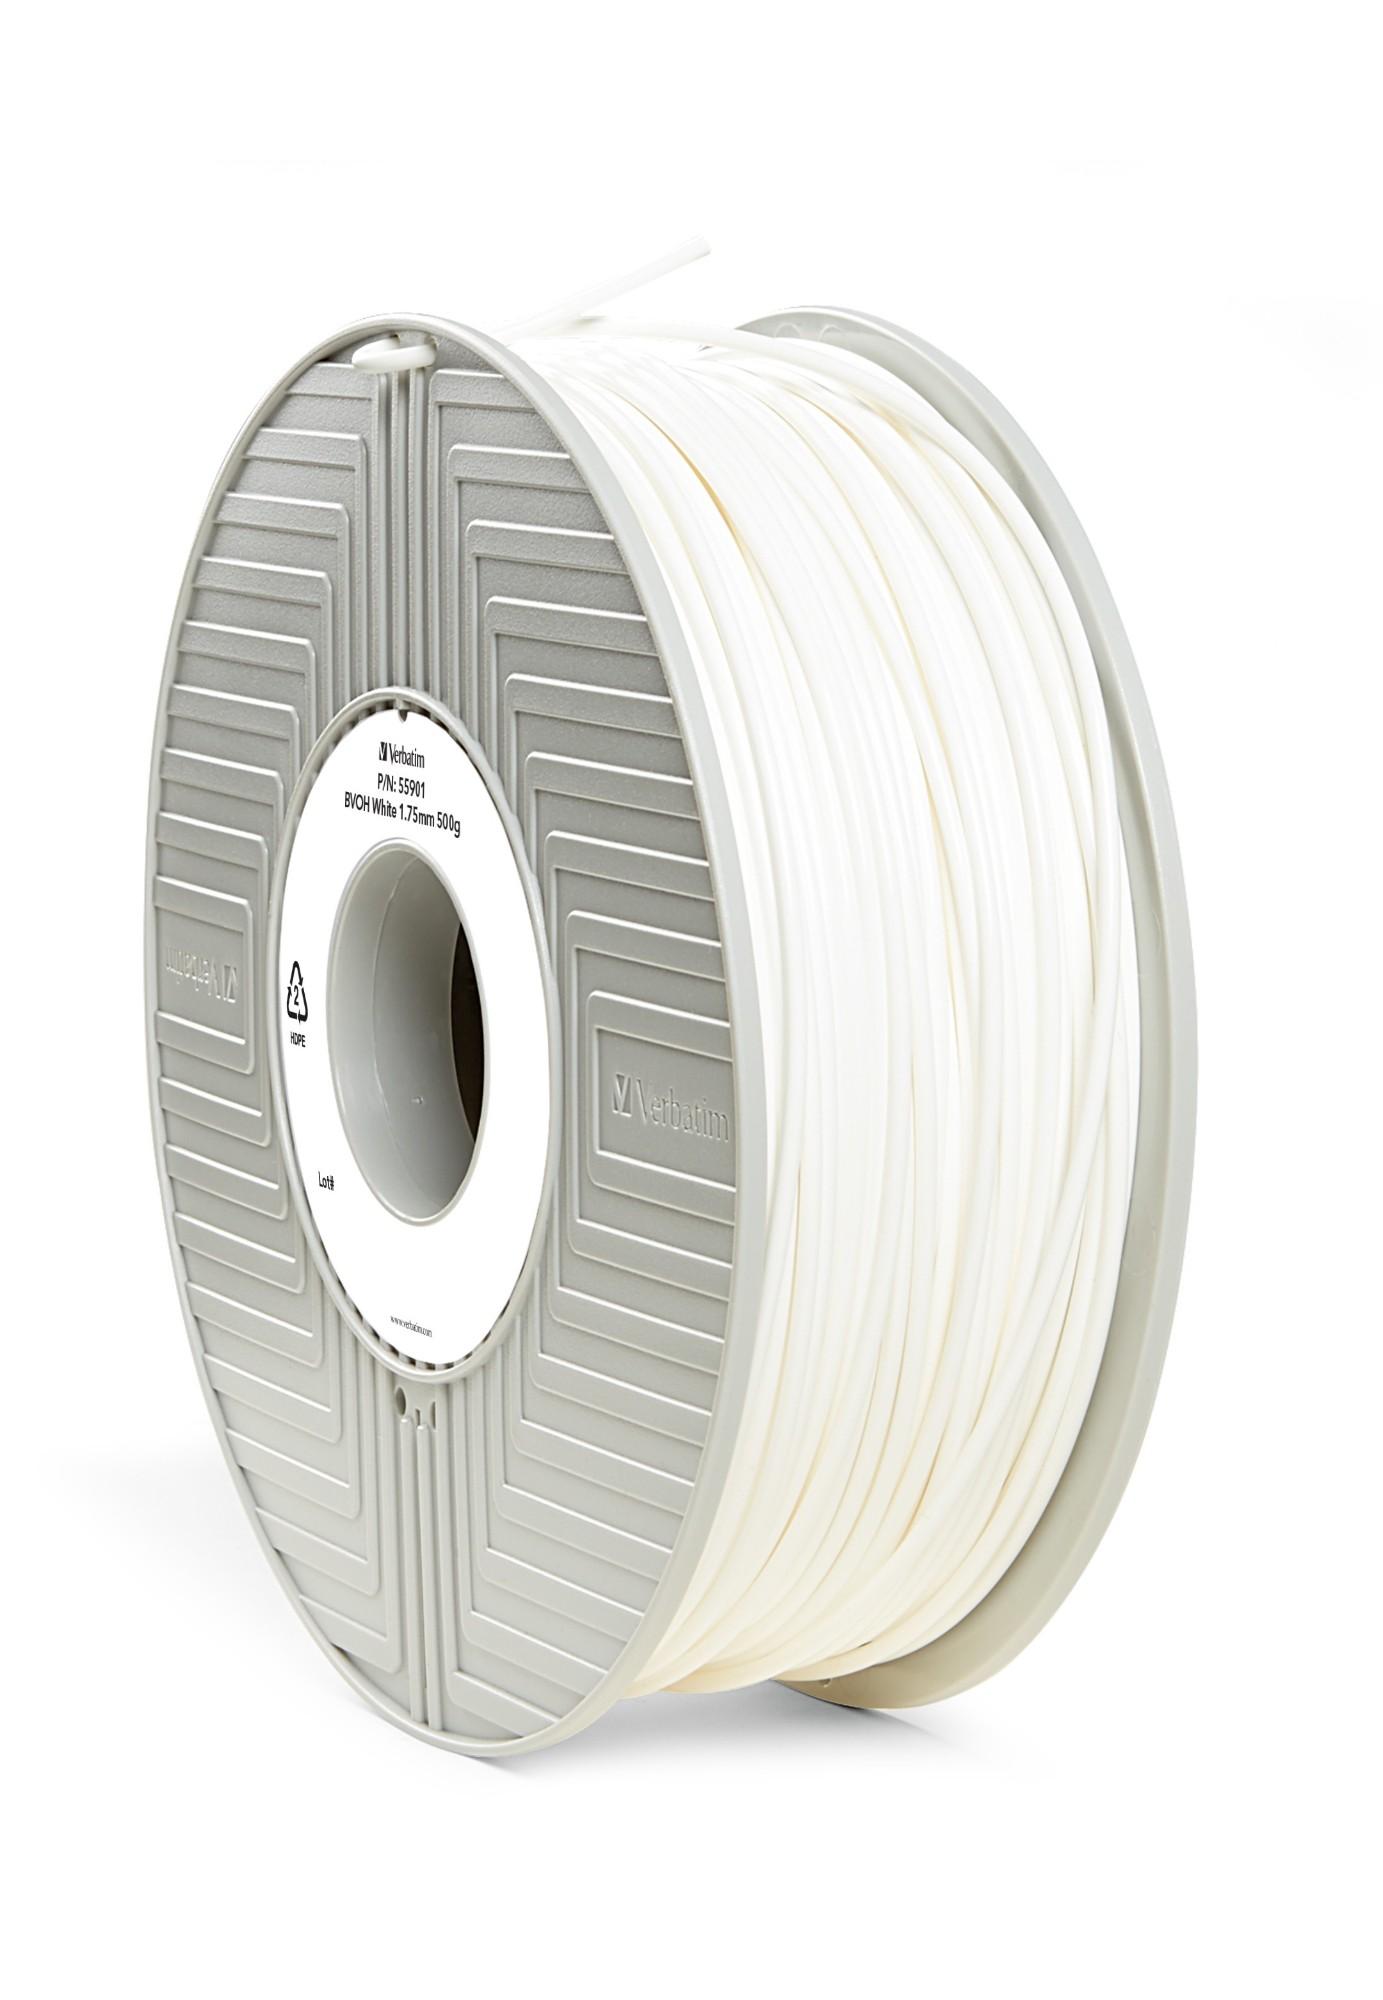 3d Printer Filament Bvoh 1.75mm 500g Transparent